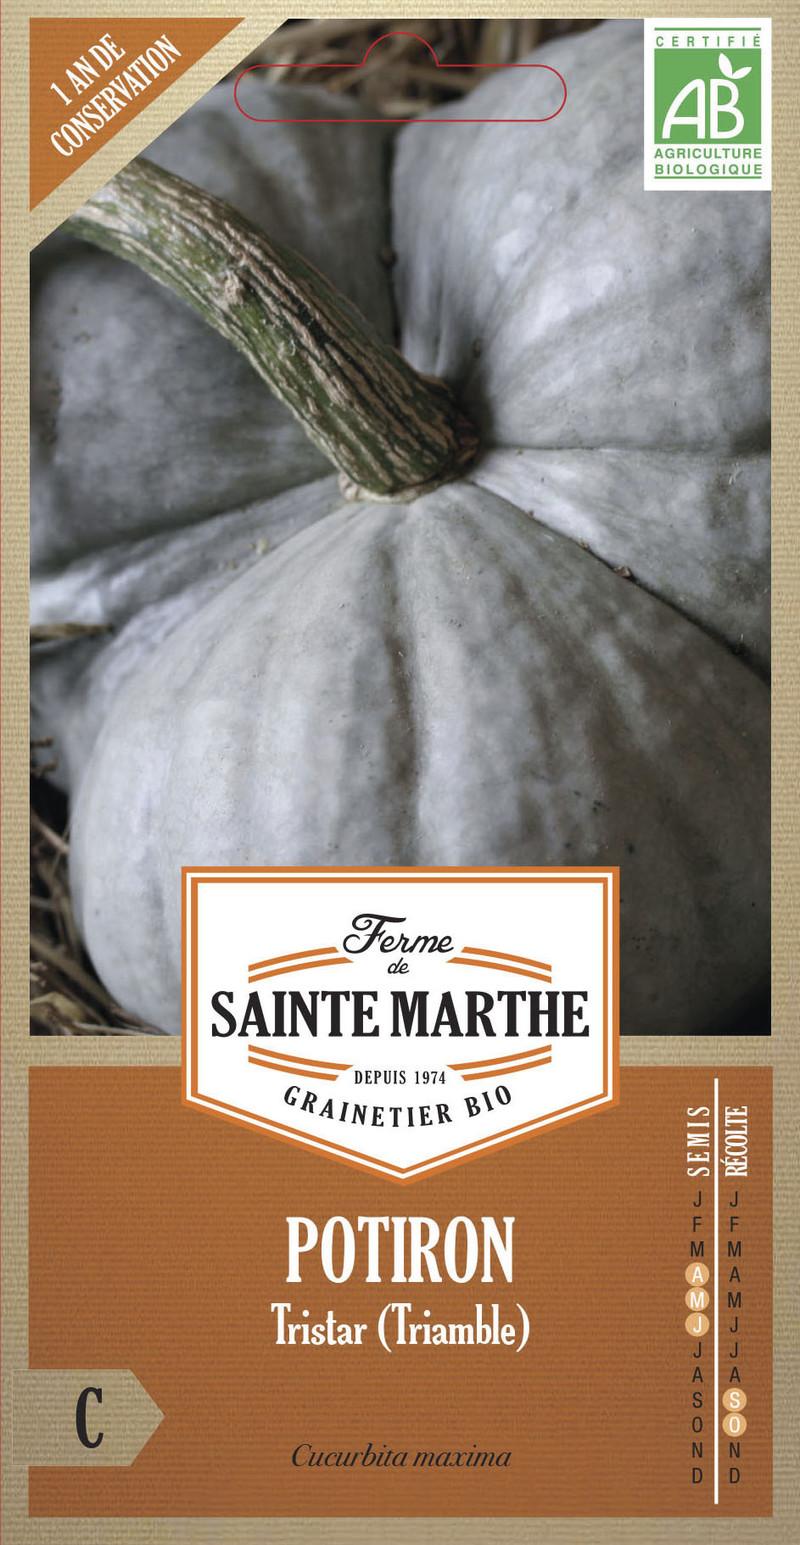 potiron tristar triamble bio ferme de sainte marthe graine semence potager sachet semis - Voir en grand